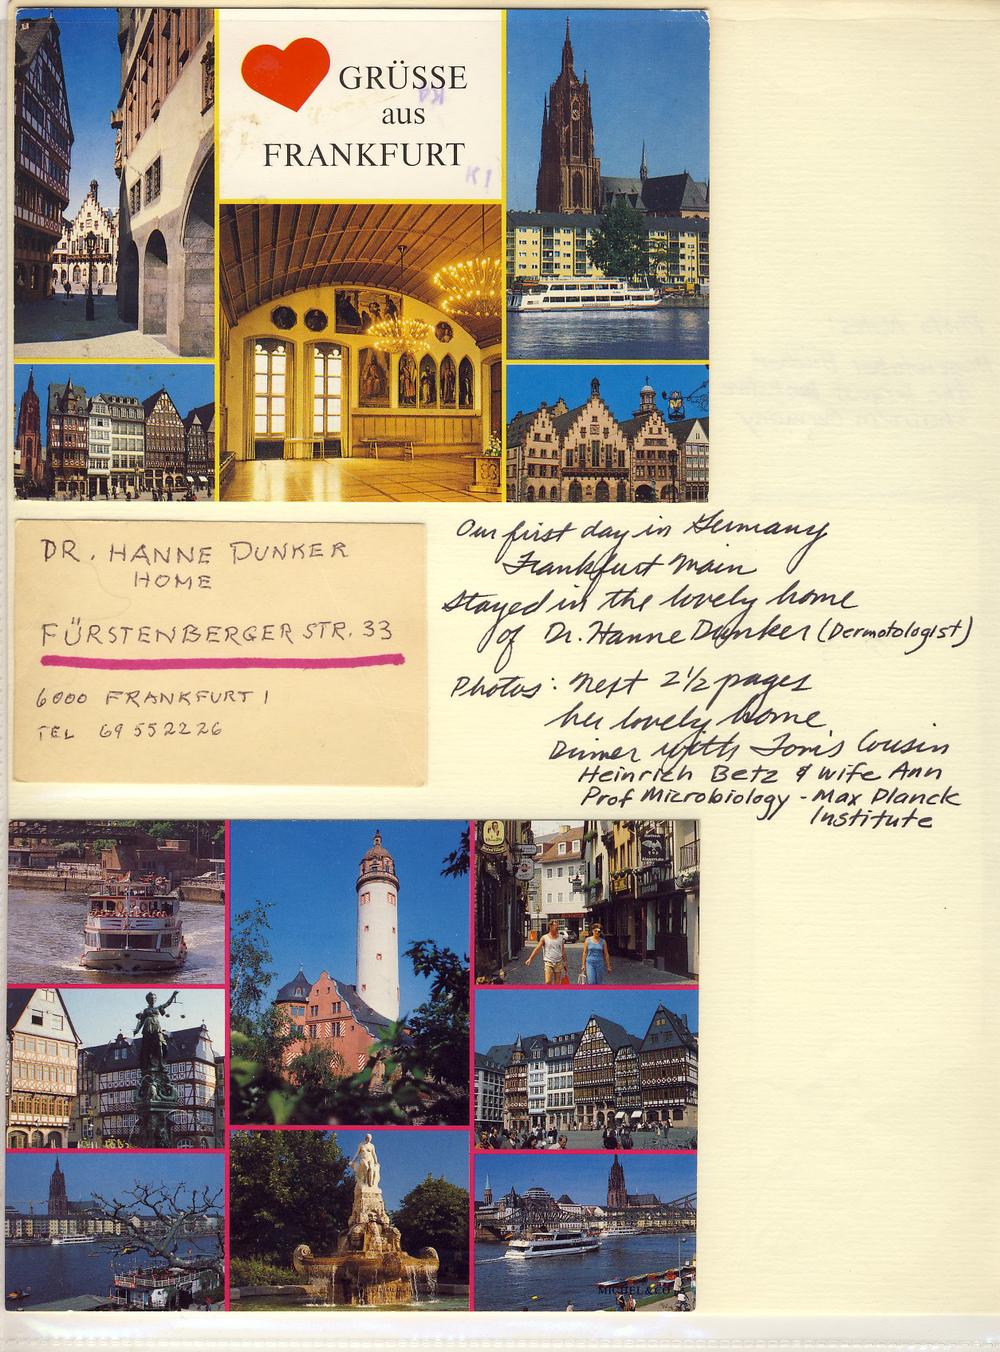 A70_Europe_1991_002.jpg